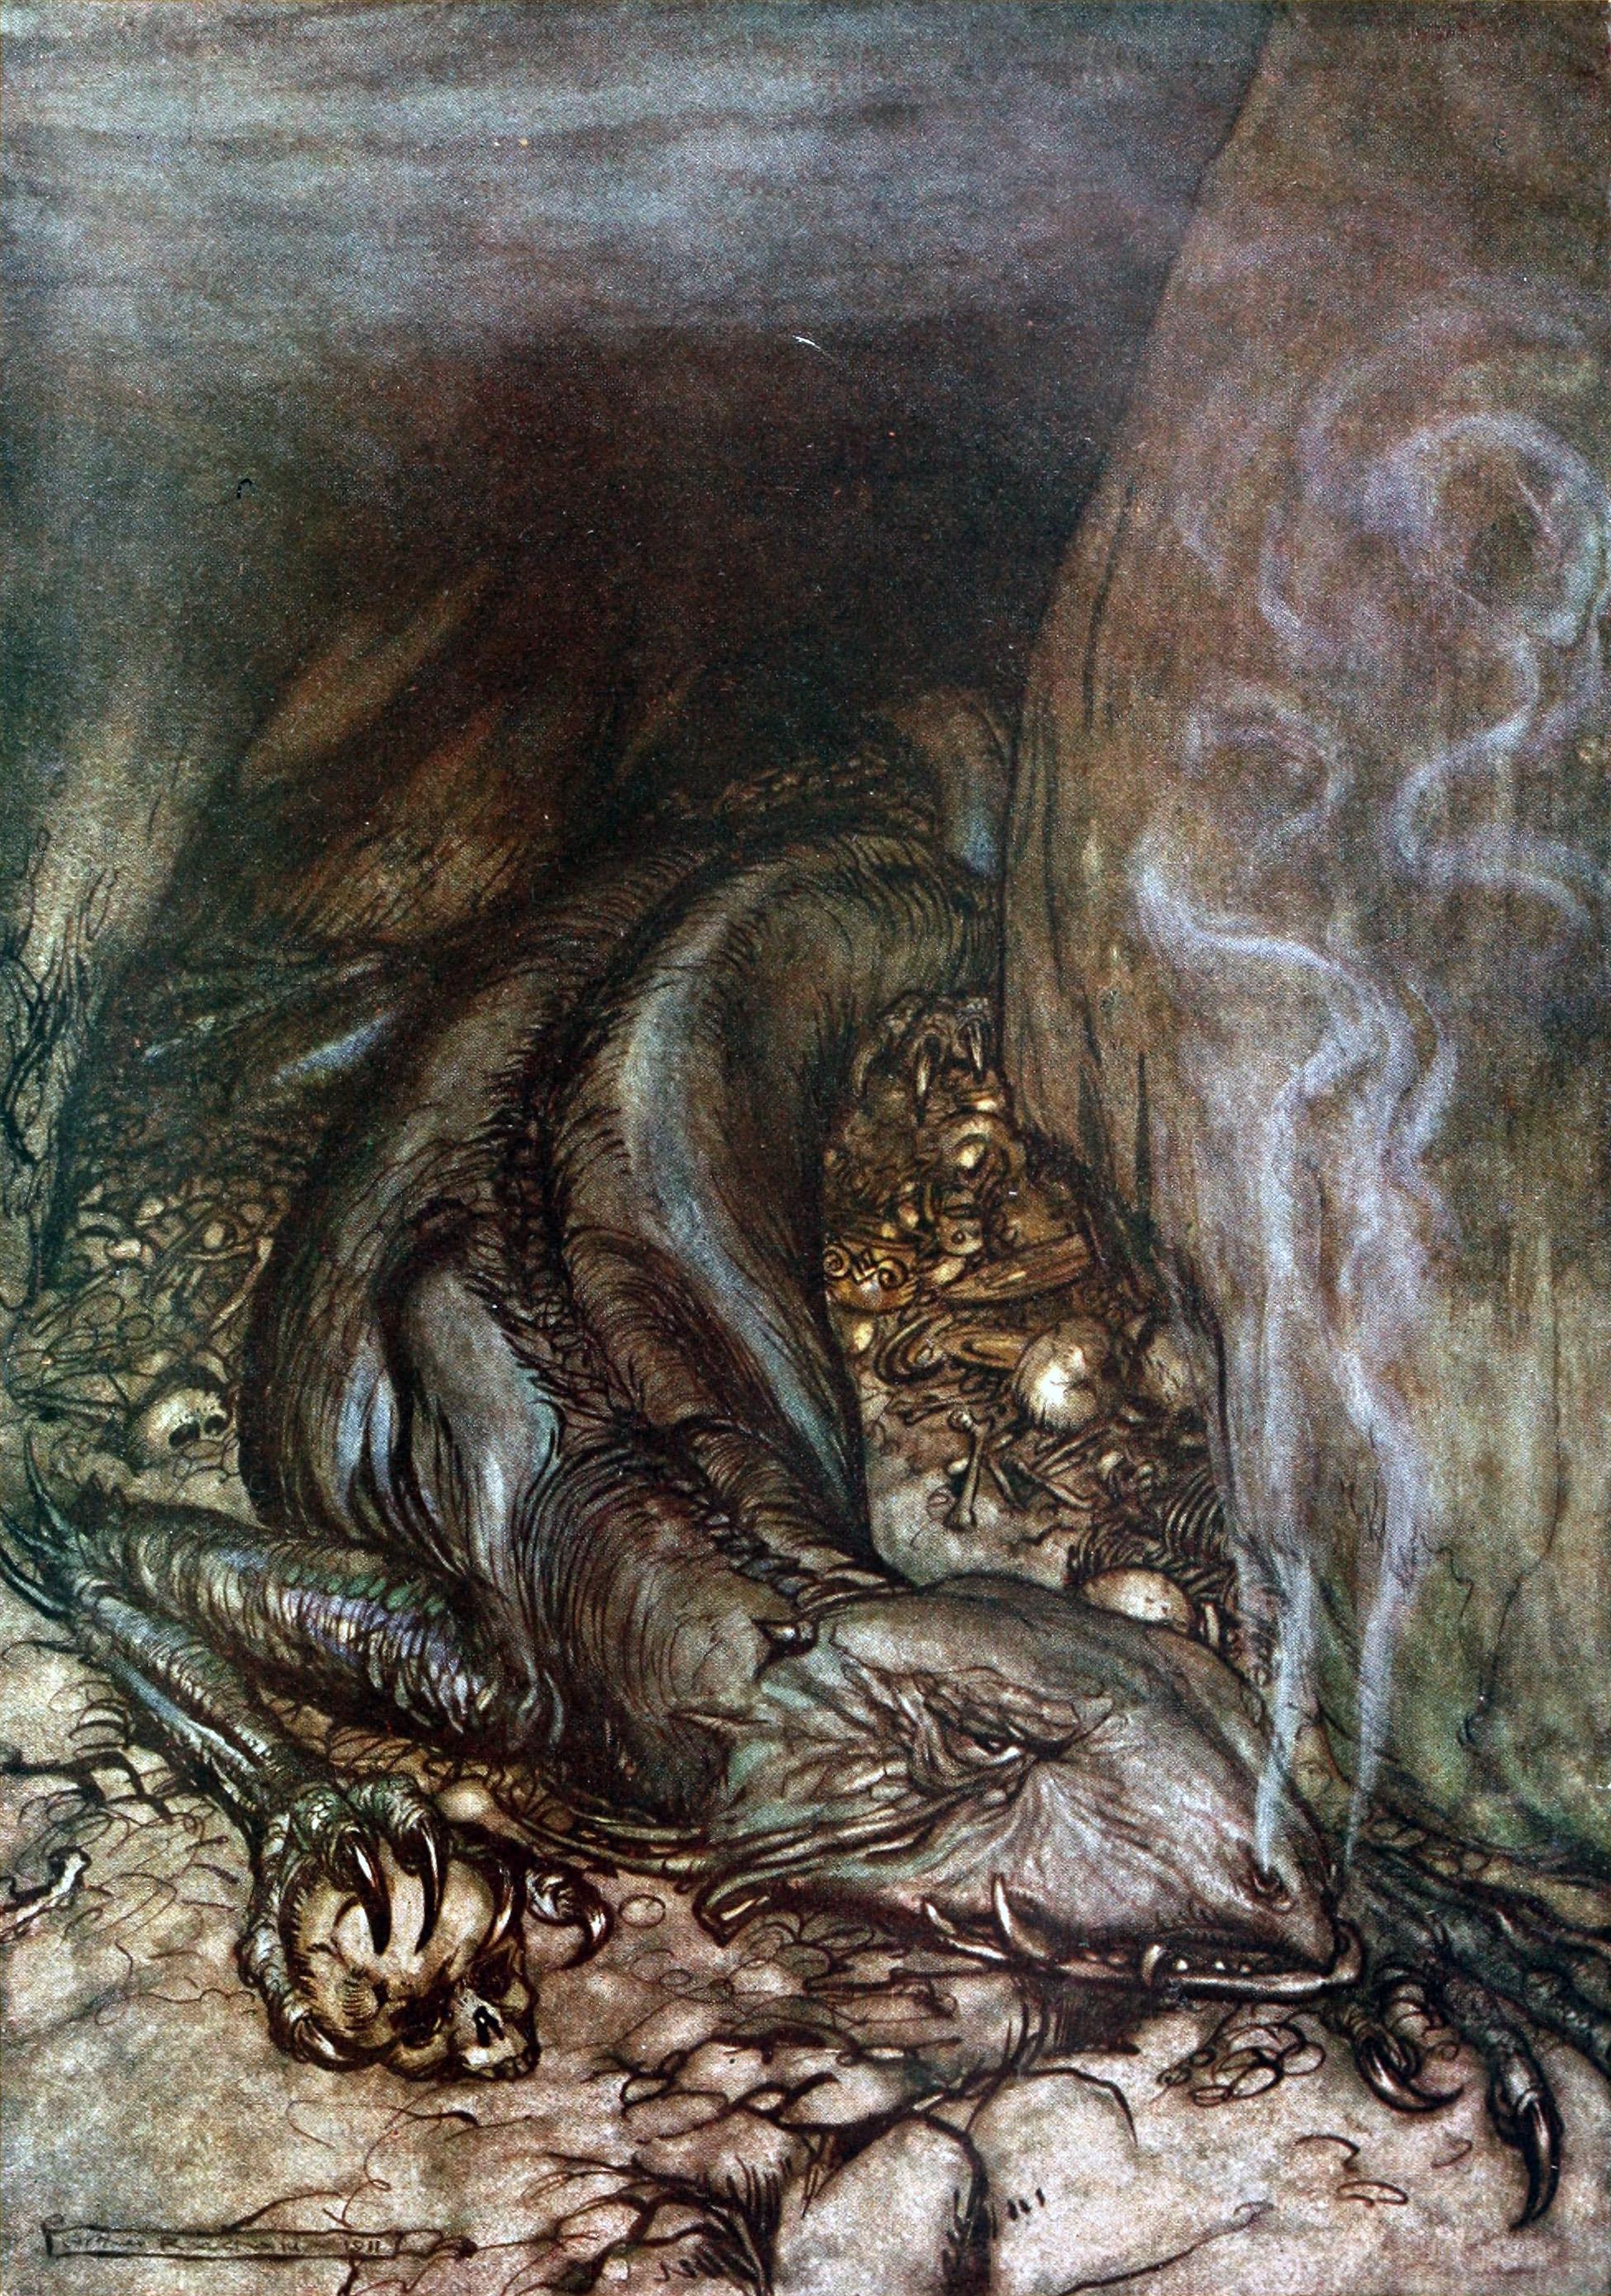 Fáfnir canh giữ kho báu (1911) – tranh của Arthur Rackham